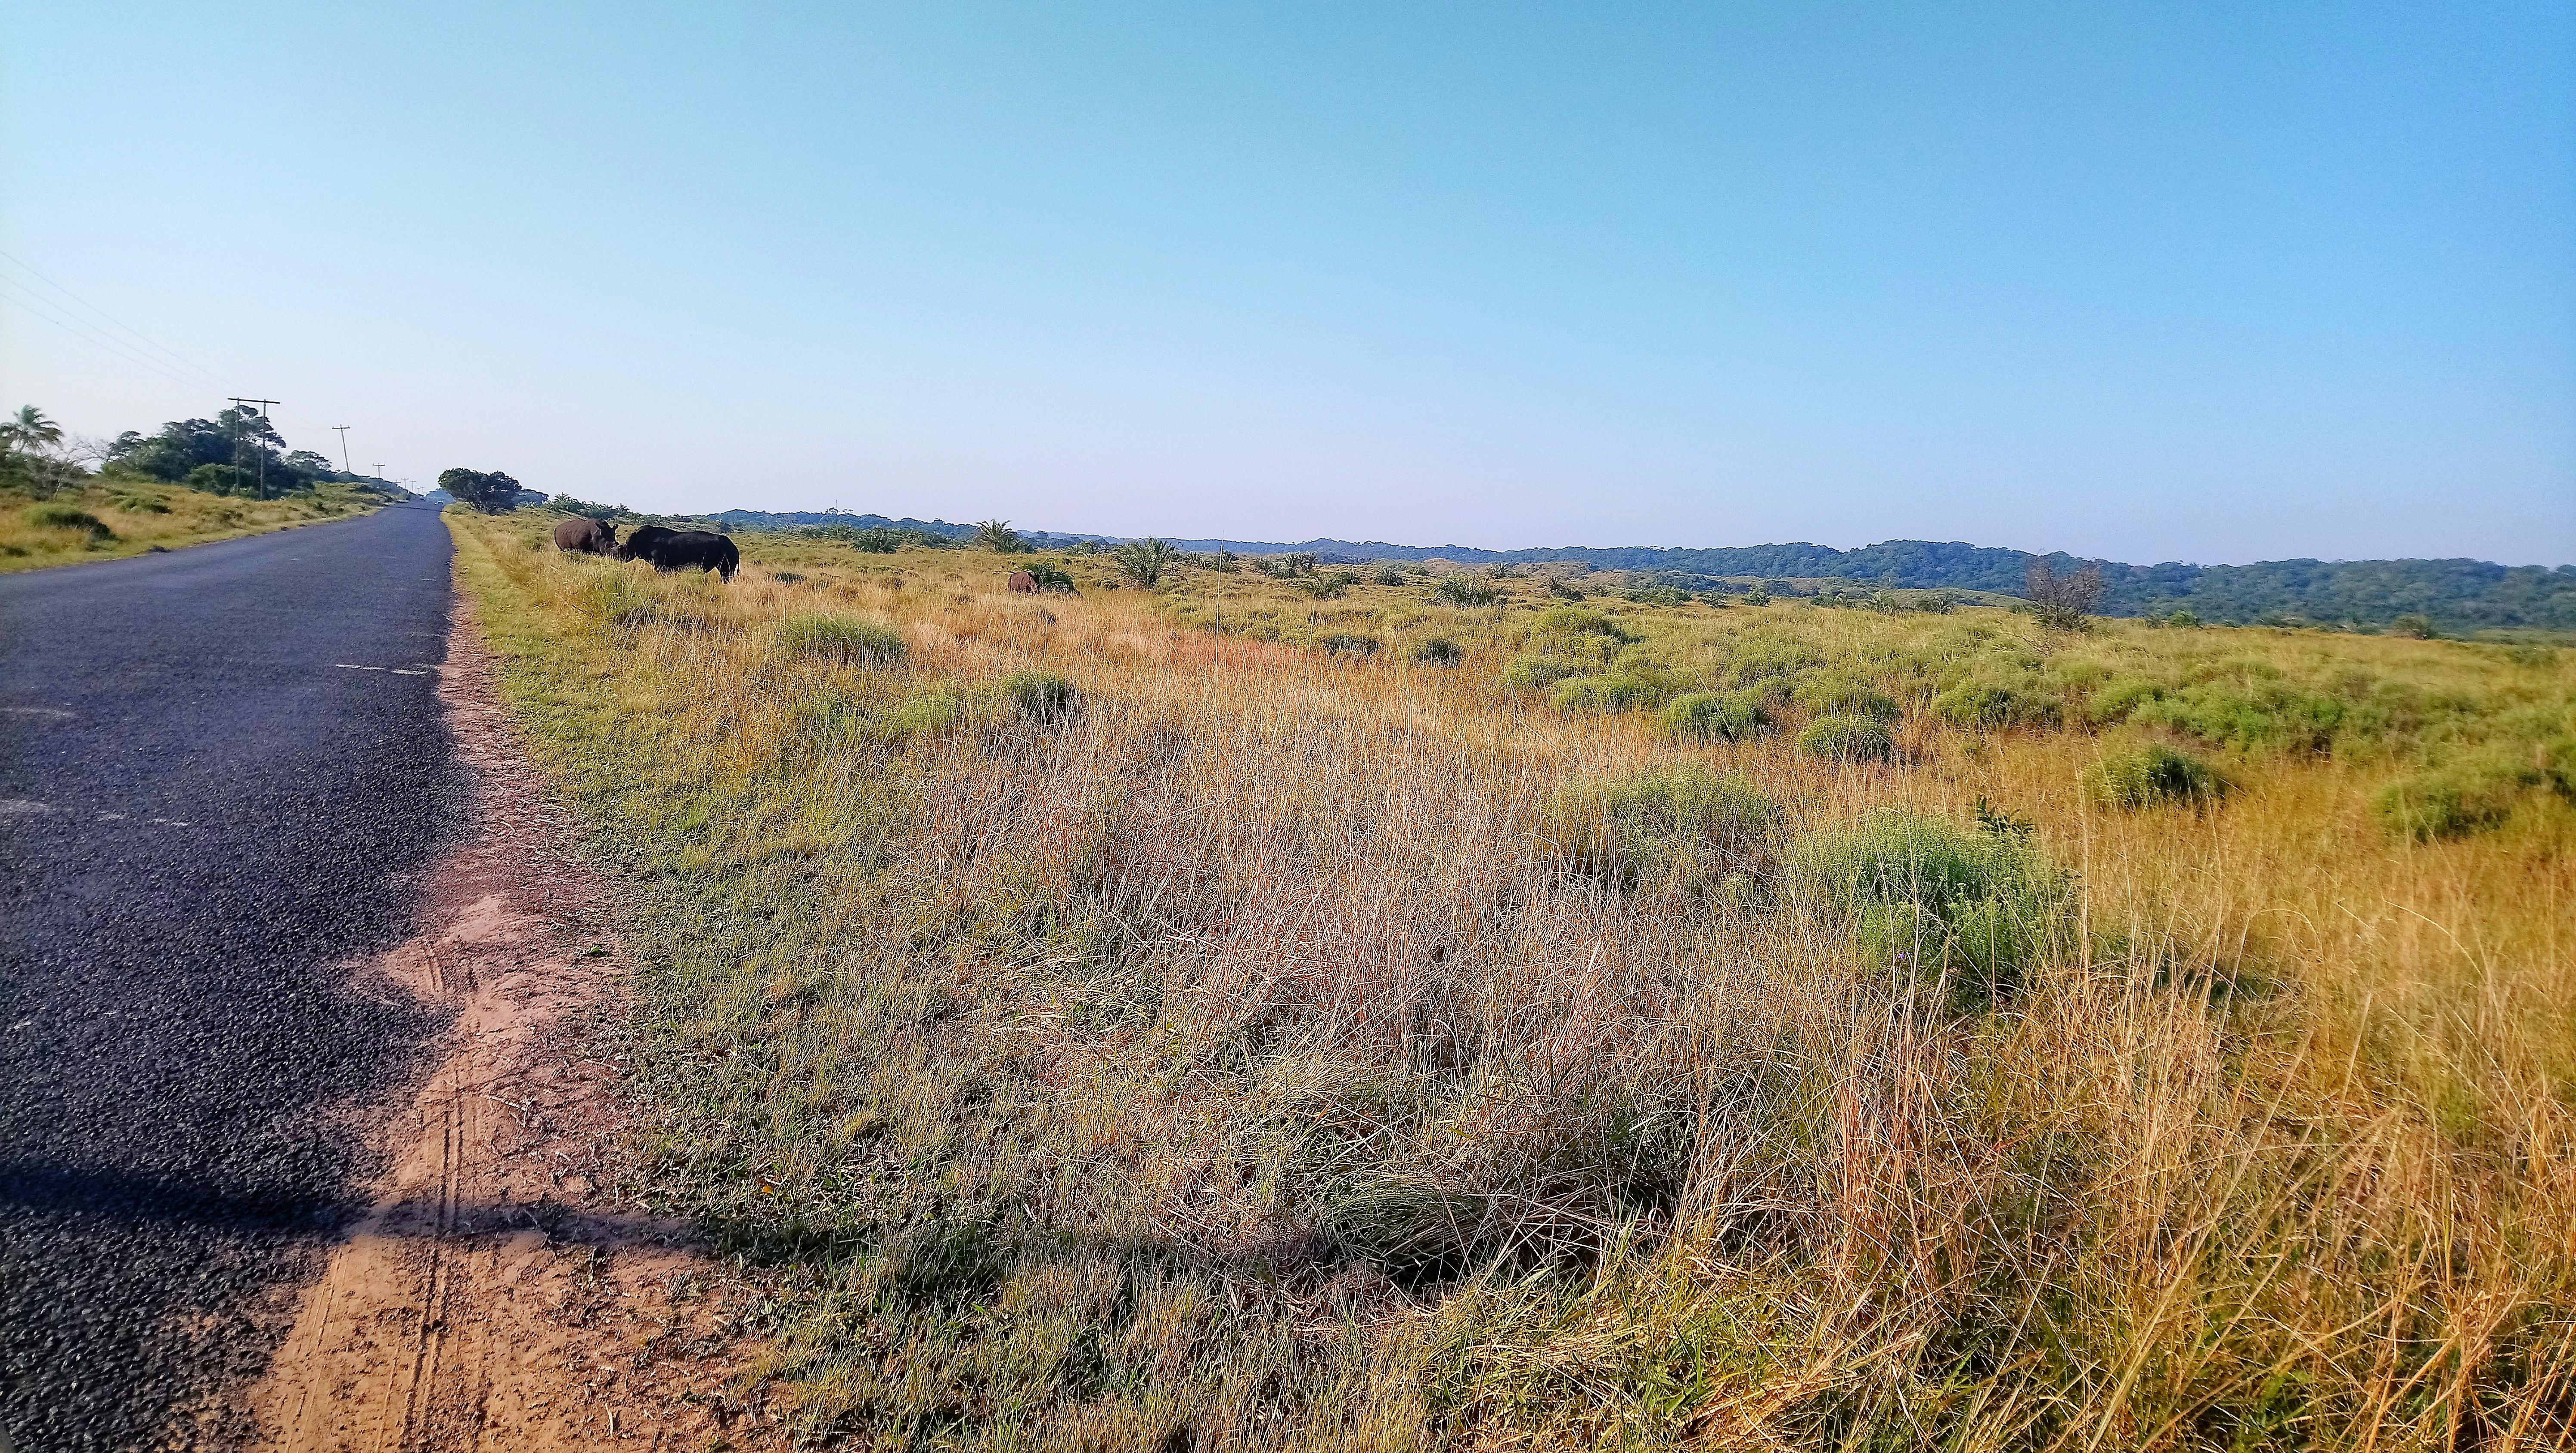 st lucia lodge, isimangaliso wetland